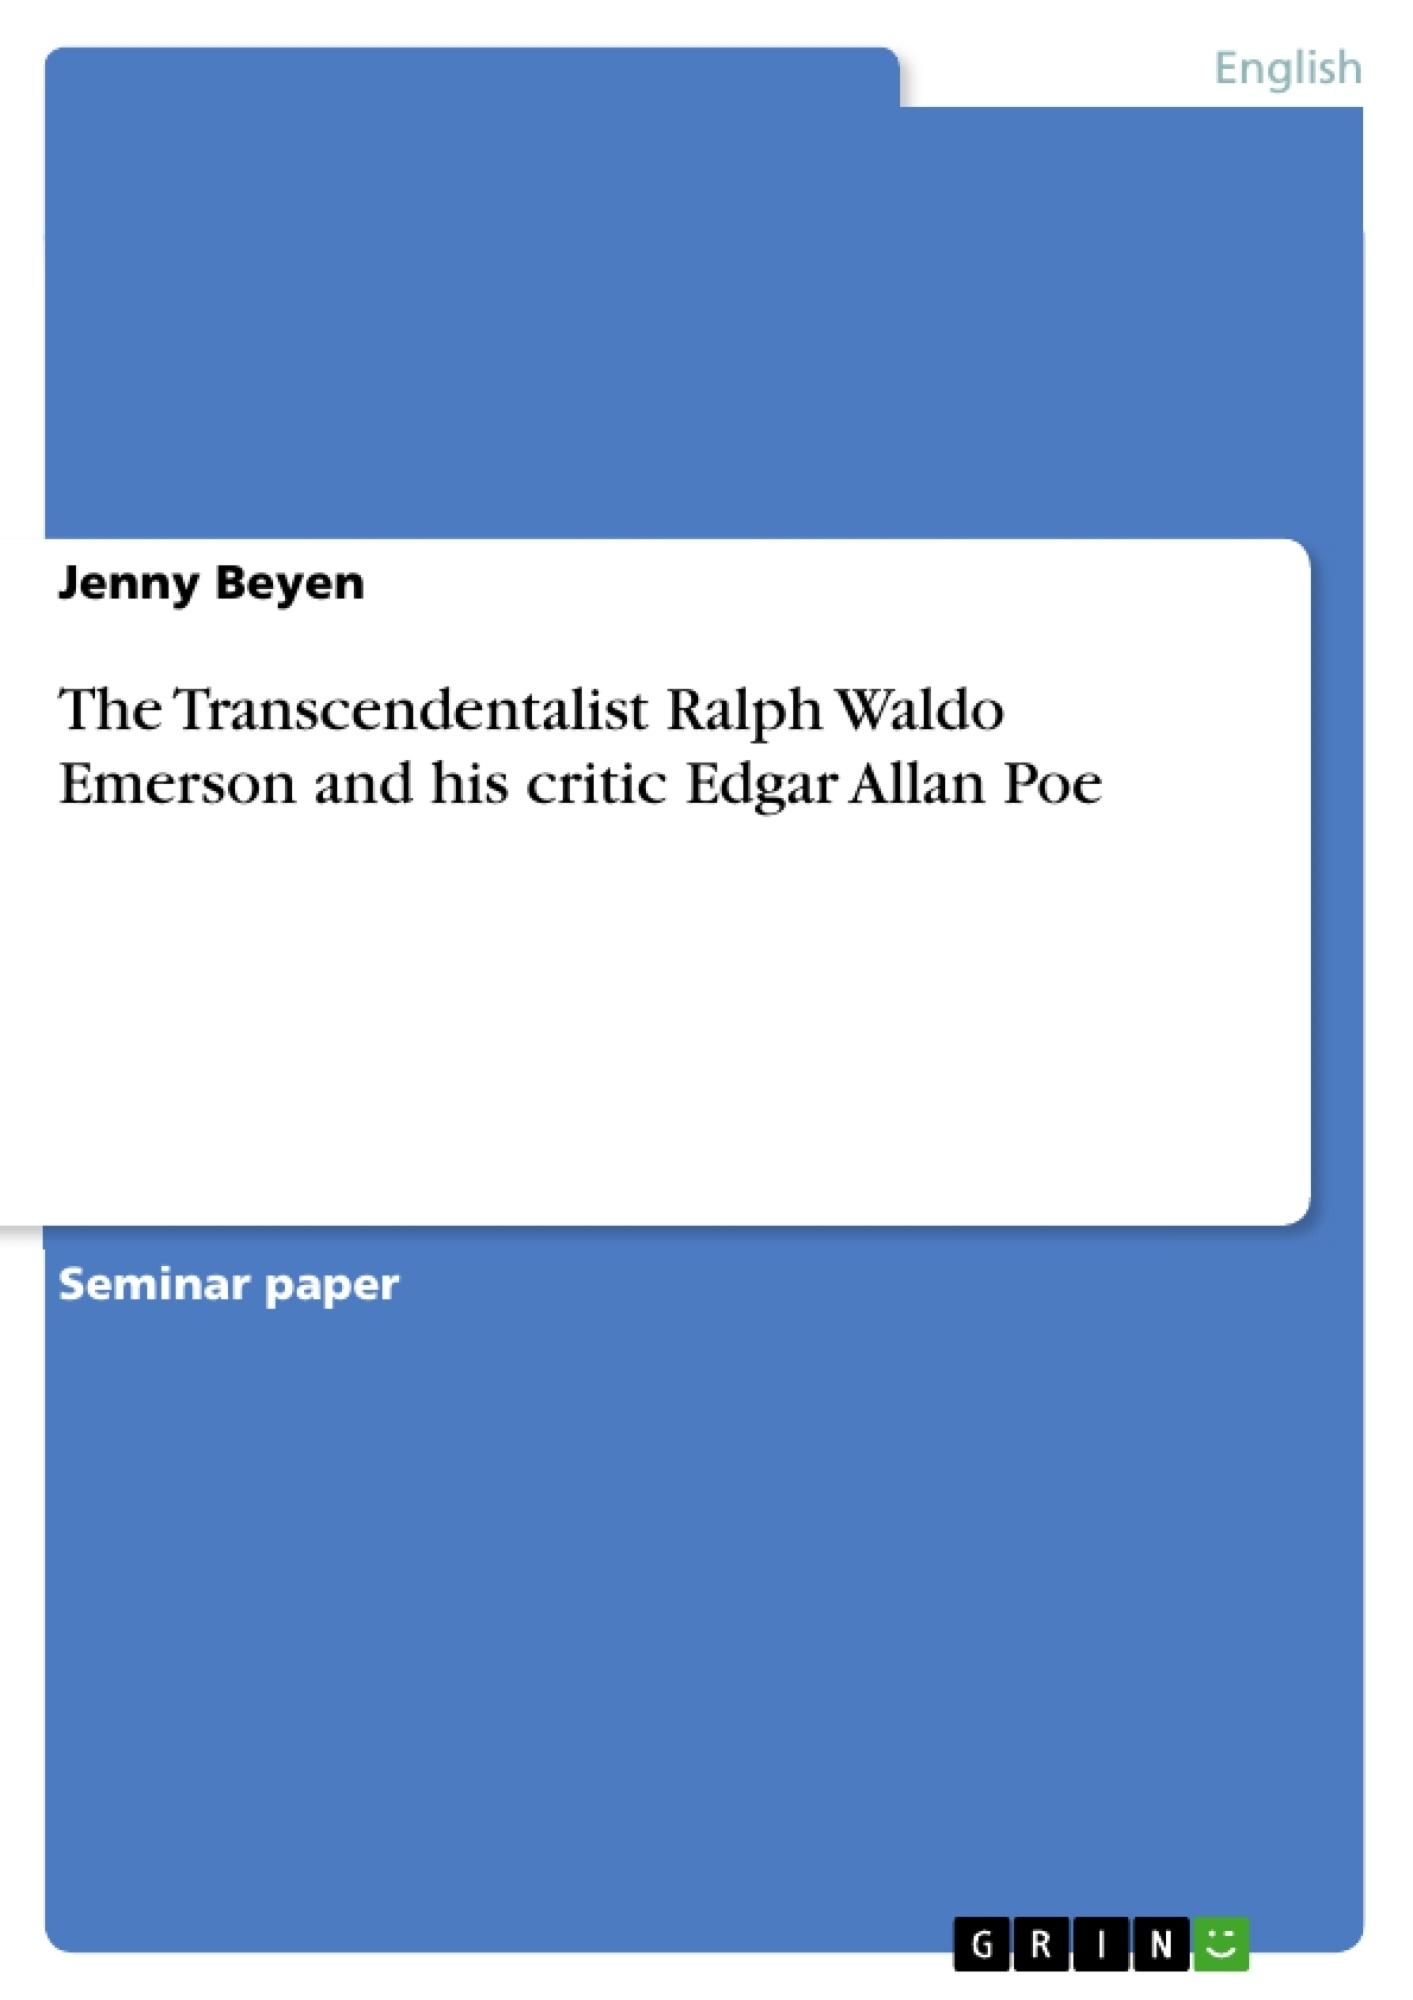 Title: The Transcendentalist Ralph Waldo Emerson  and his critic Edgar Allan Poe